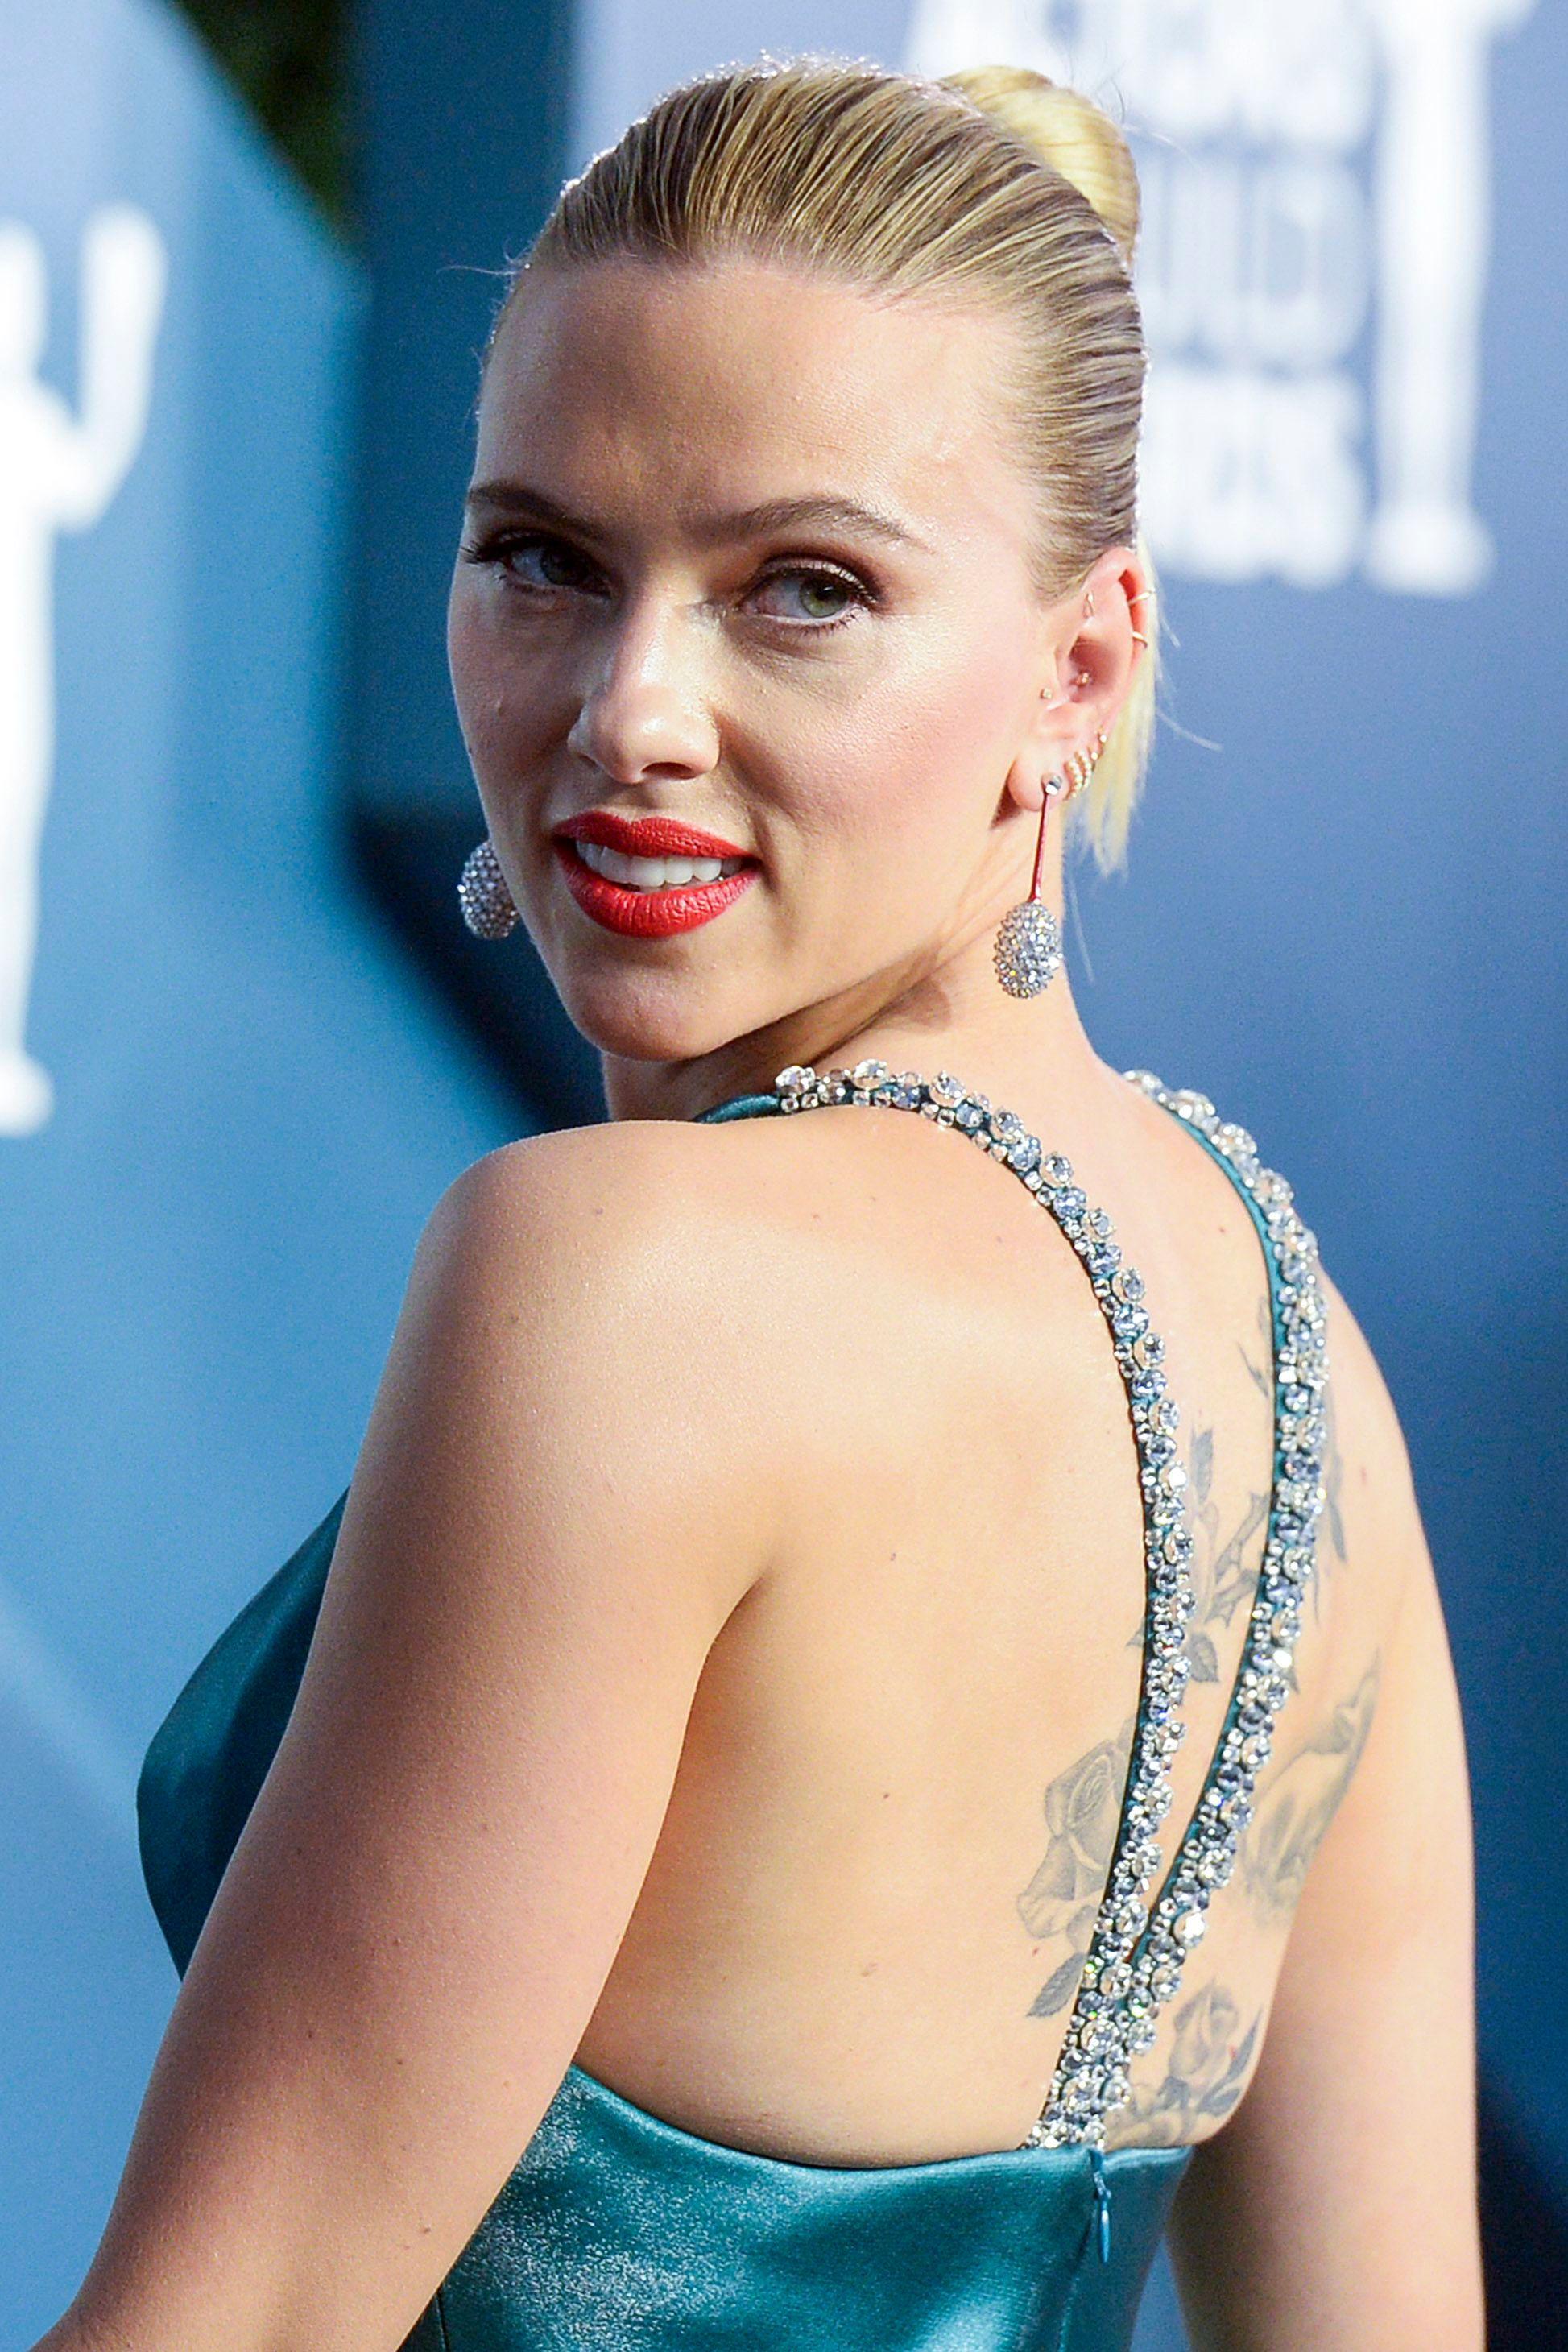 Scarlett Johansson26th Annual Screen Actors Guild Awards, Arrivals, Shrine Auditorium, Los Angeles, USA - 19 Jan 2020